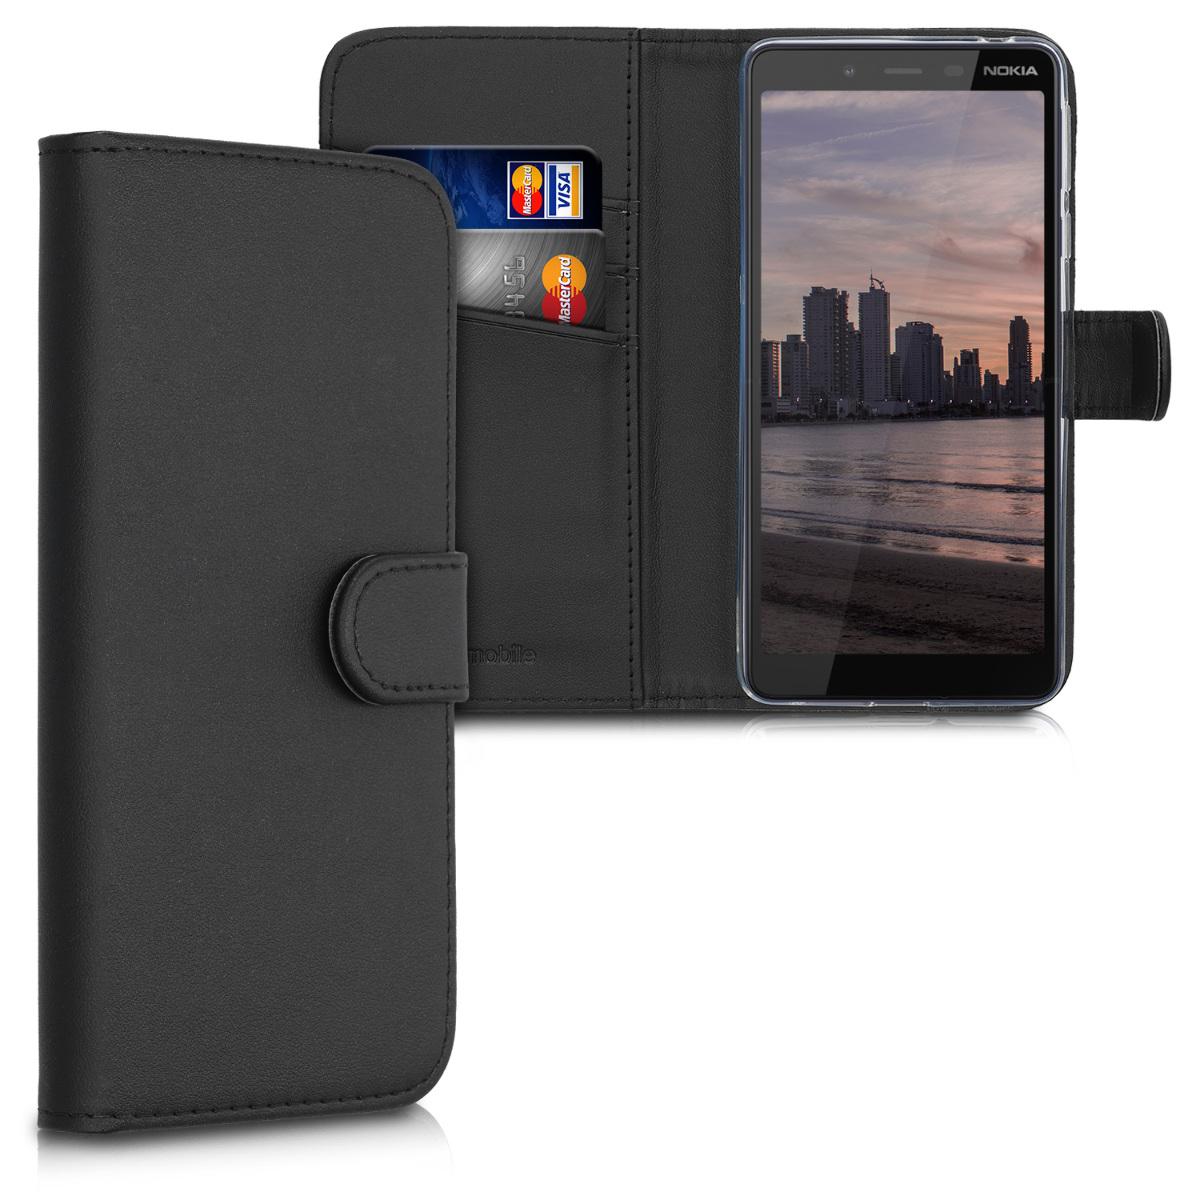 KW Θήκη - Πορτοφόλι Nokia 1 Plus - Protective PU Leather Flip Cover - Black (49890.01)